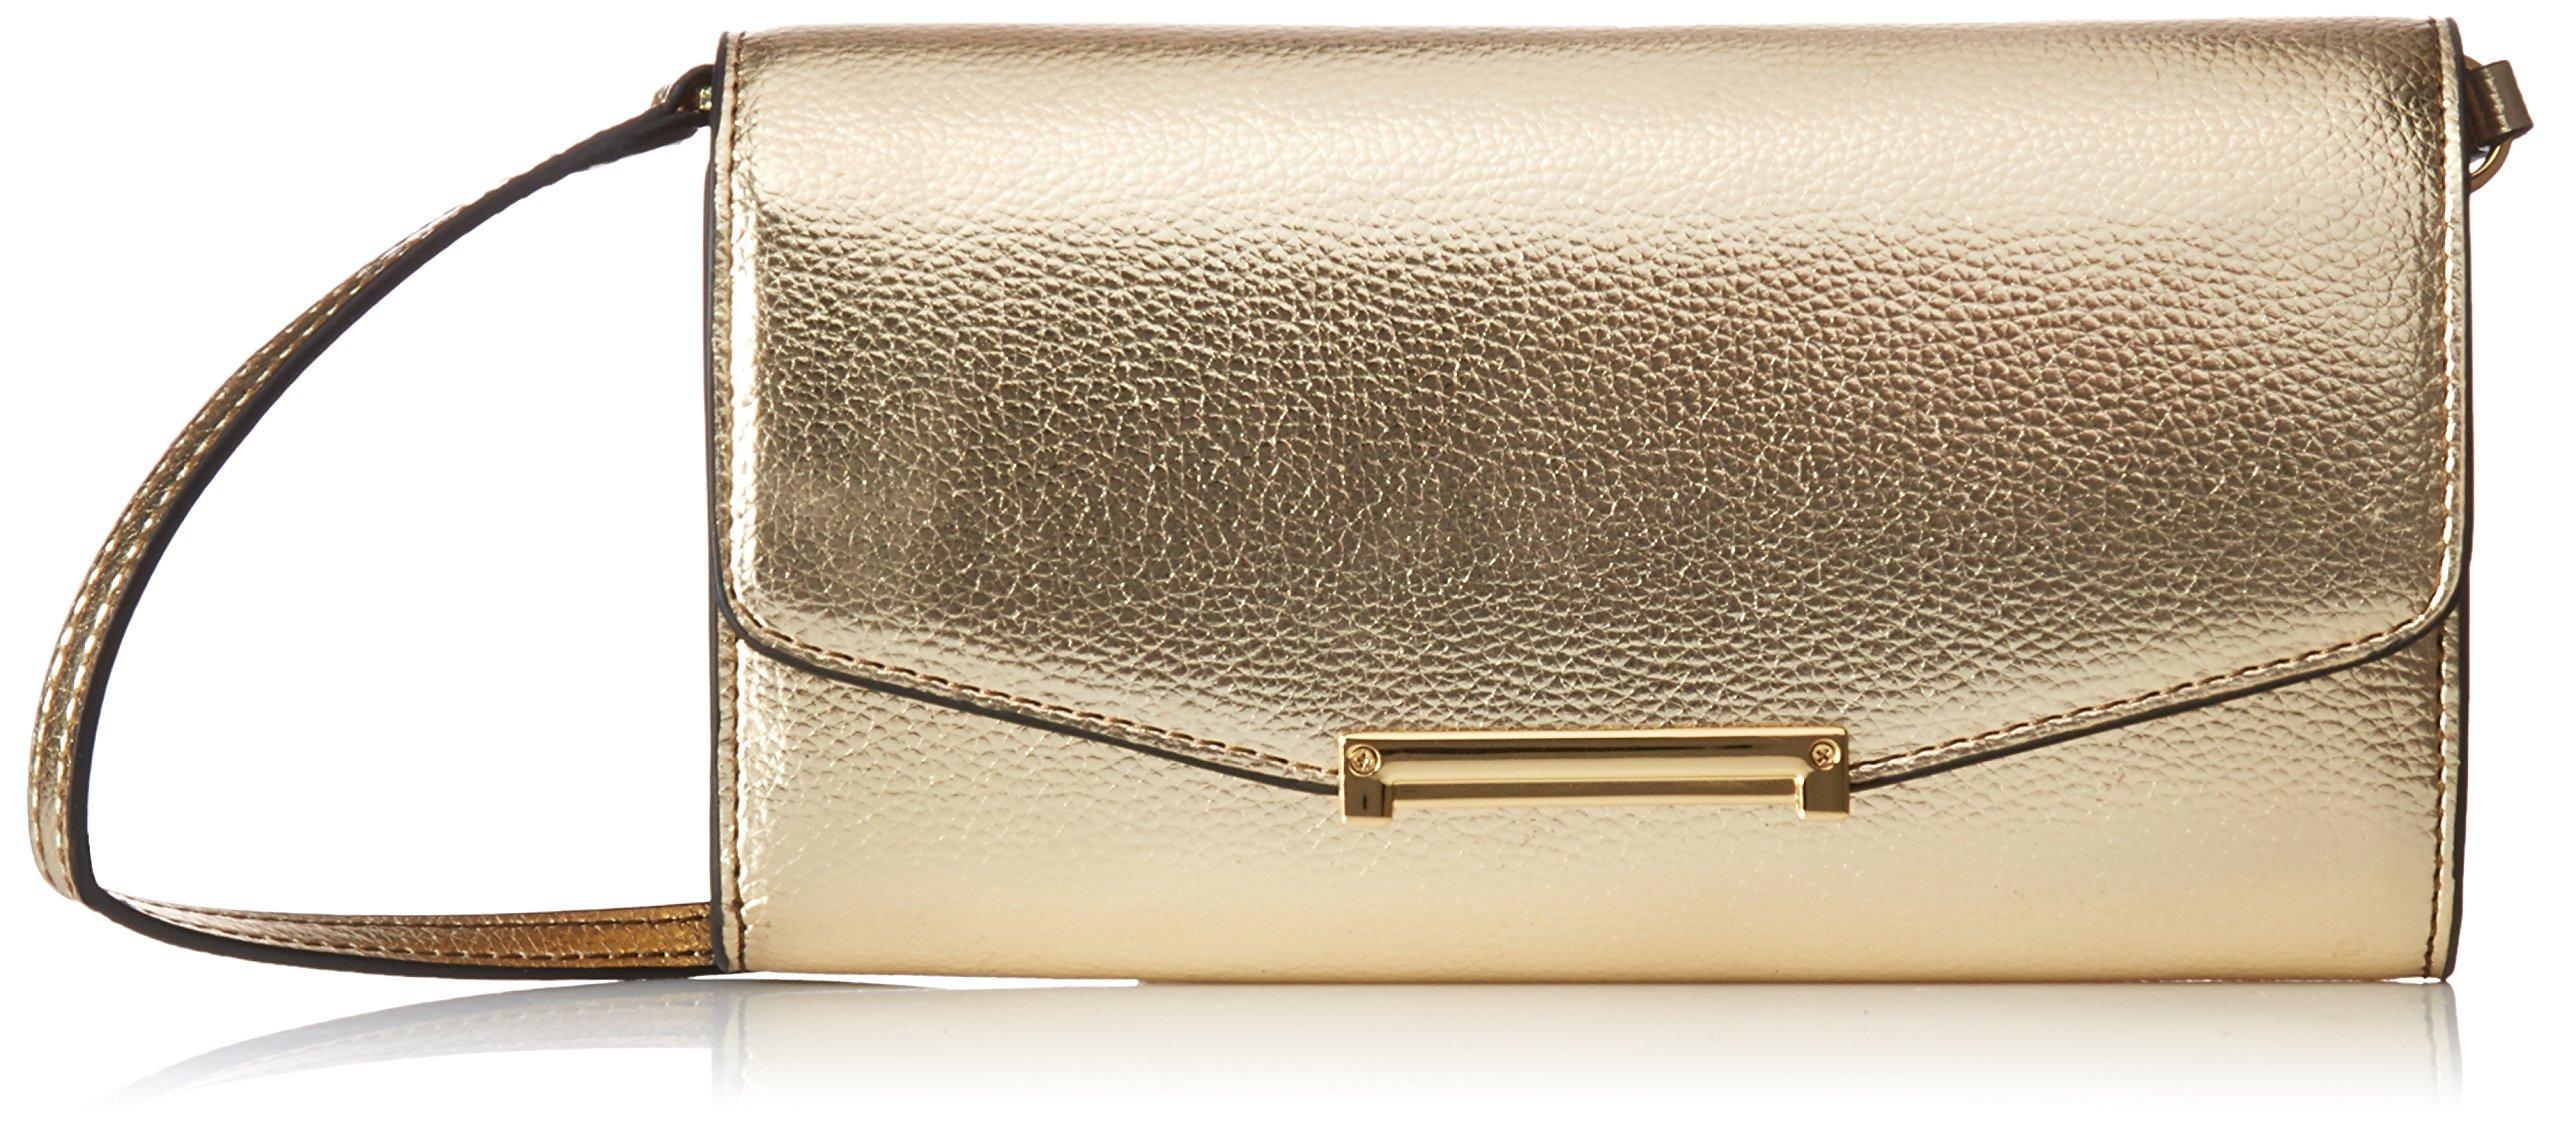 Ivanka Trump Mara Crossbody Wallet-Gold, Metallic Pebble